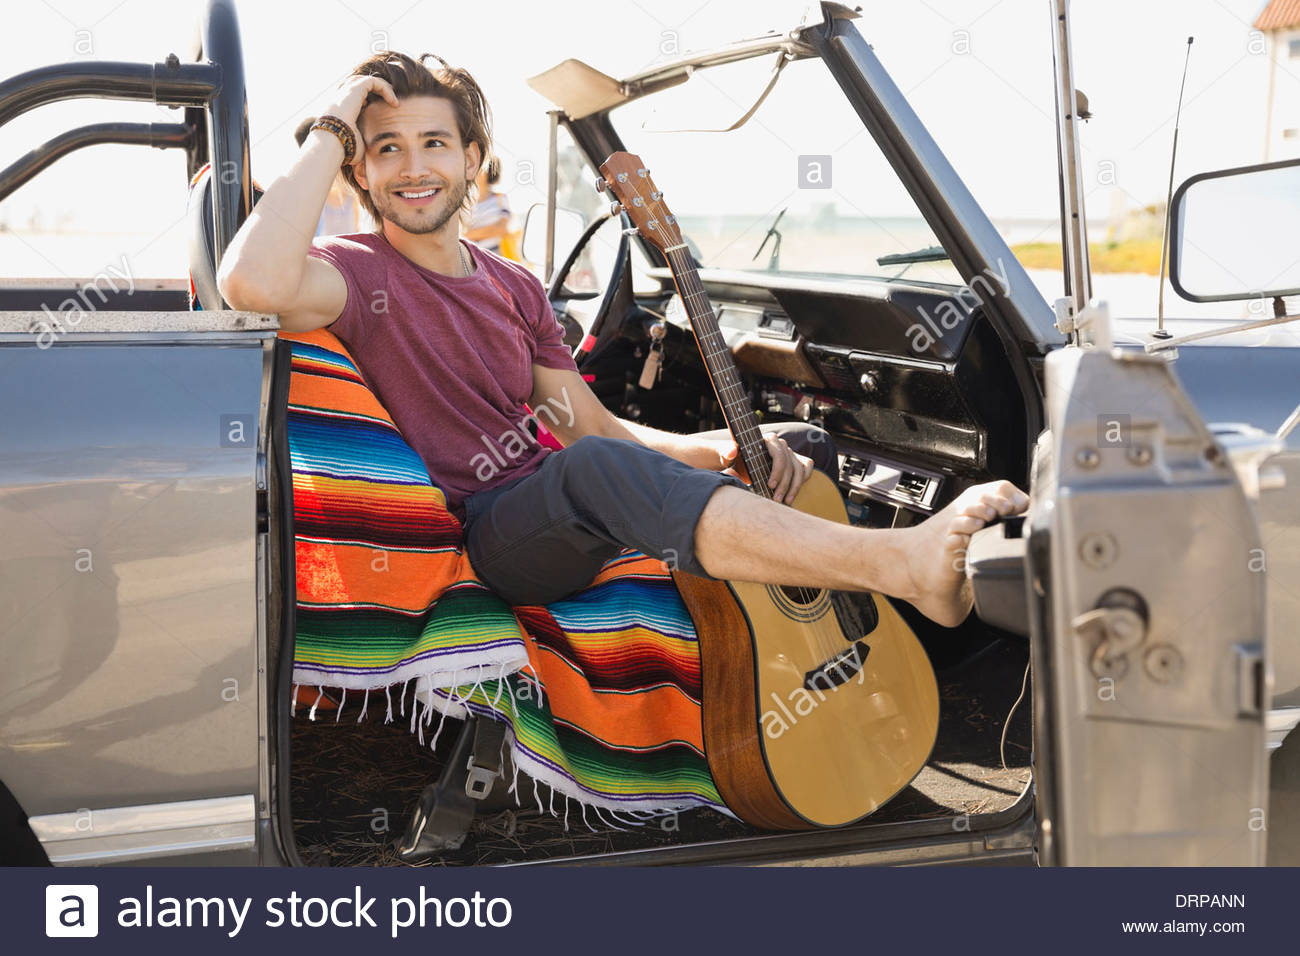 Mann mit Gitarre im Off-Road-Fahrzeug sitzen Stockbild